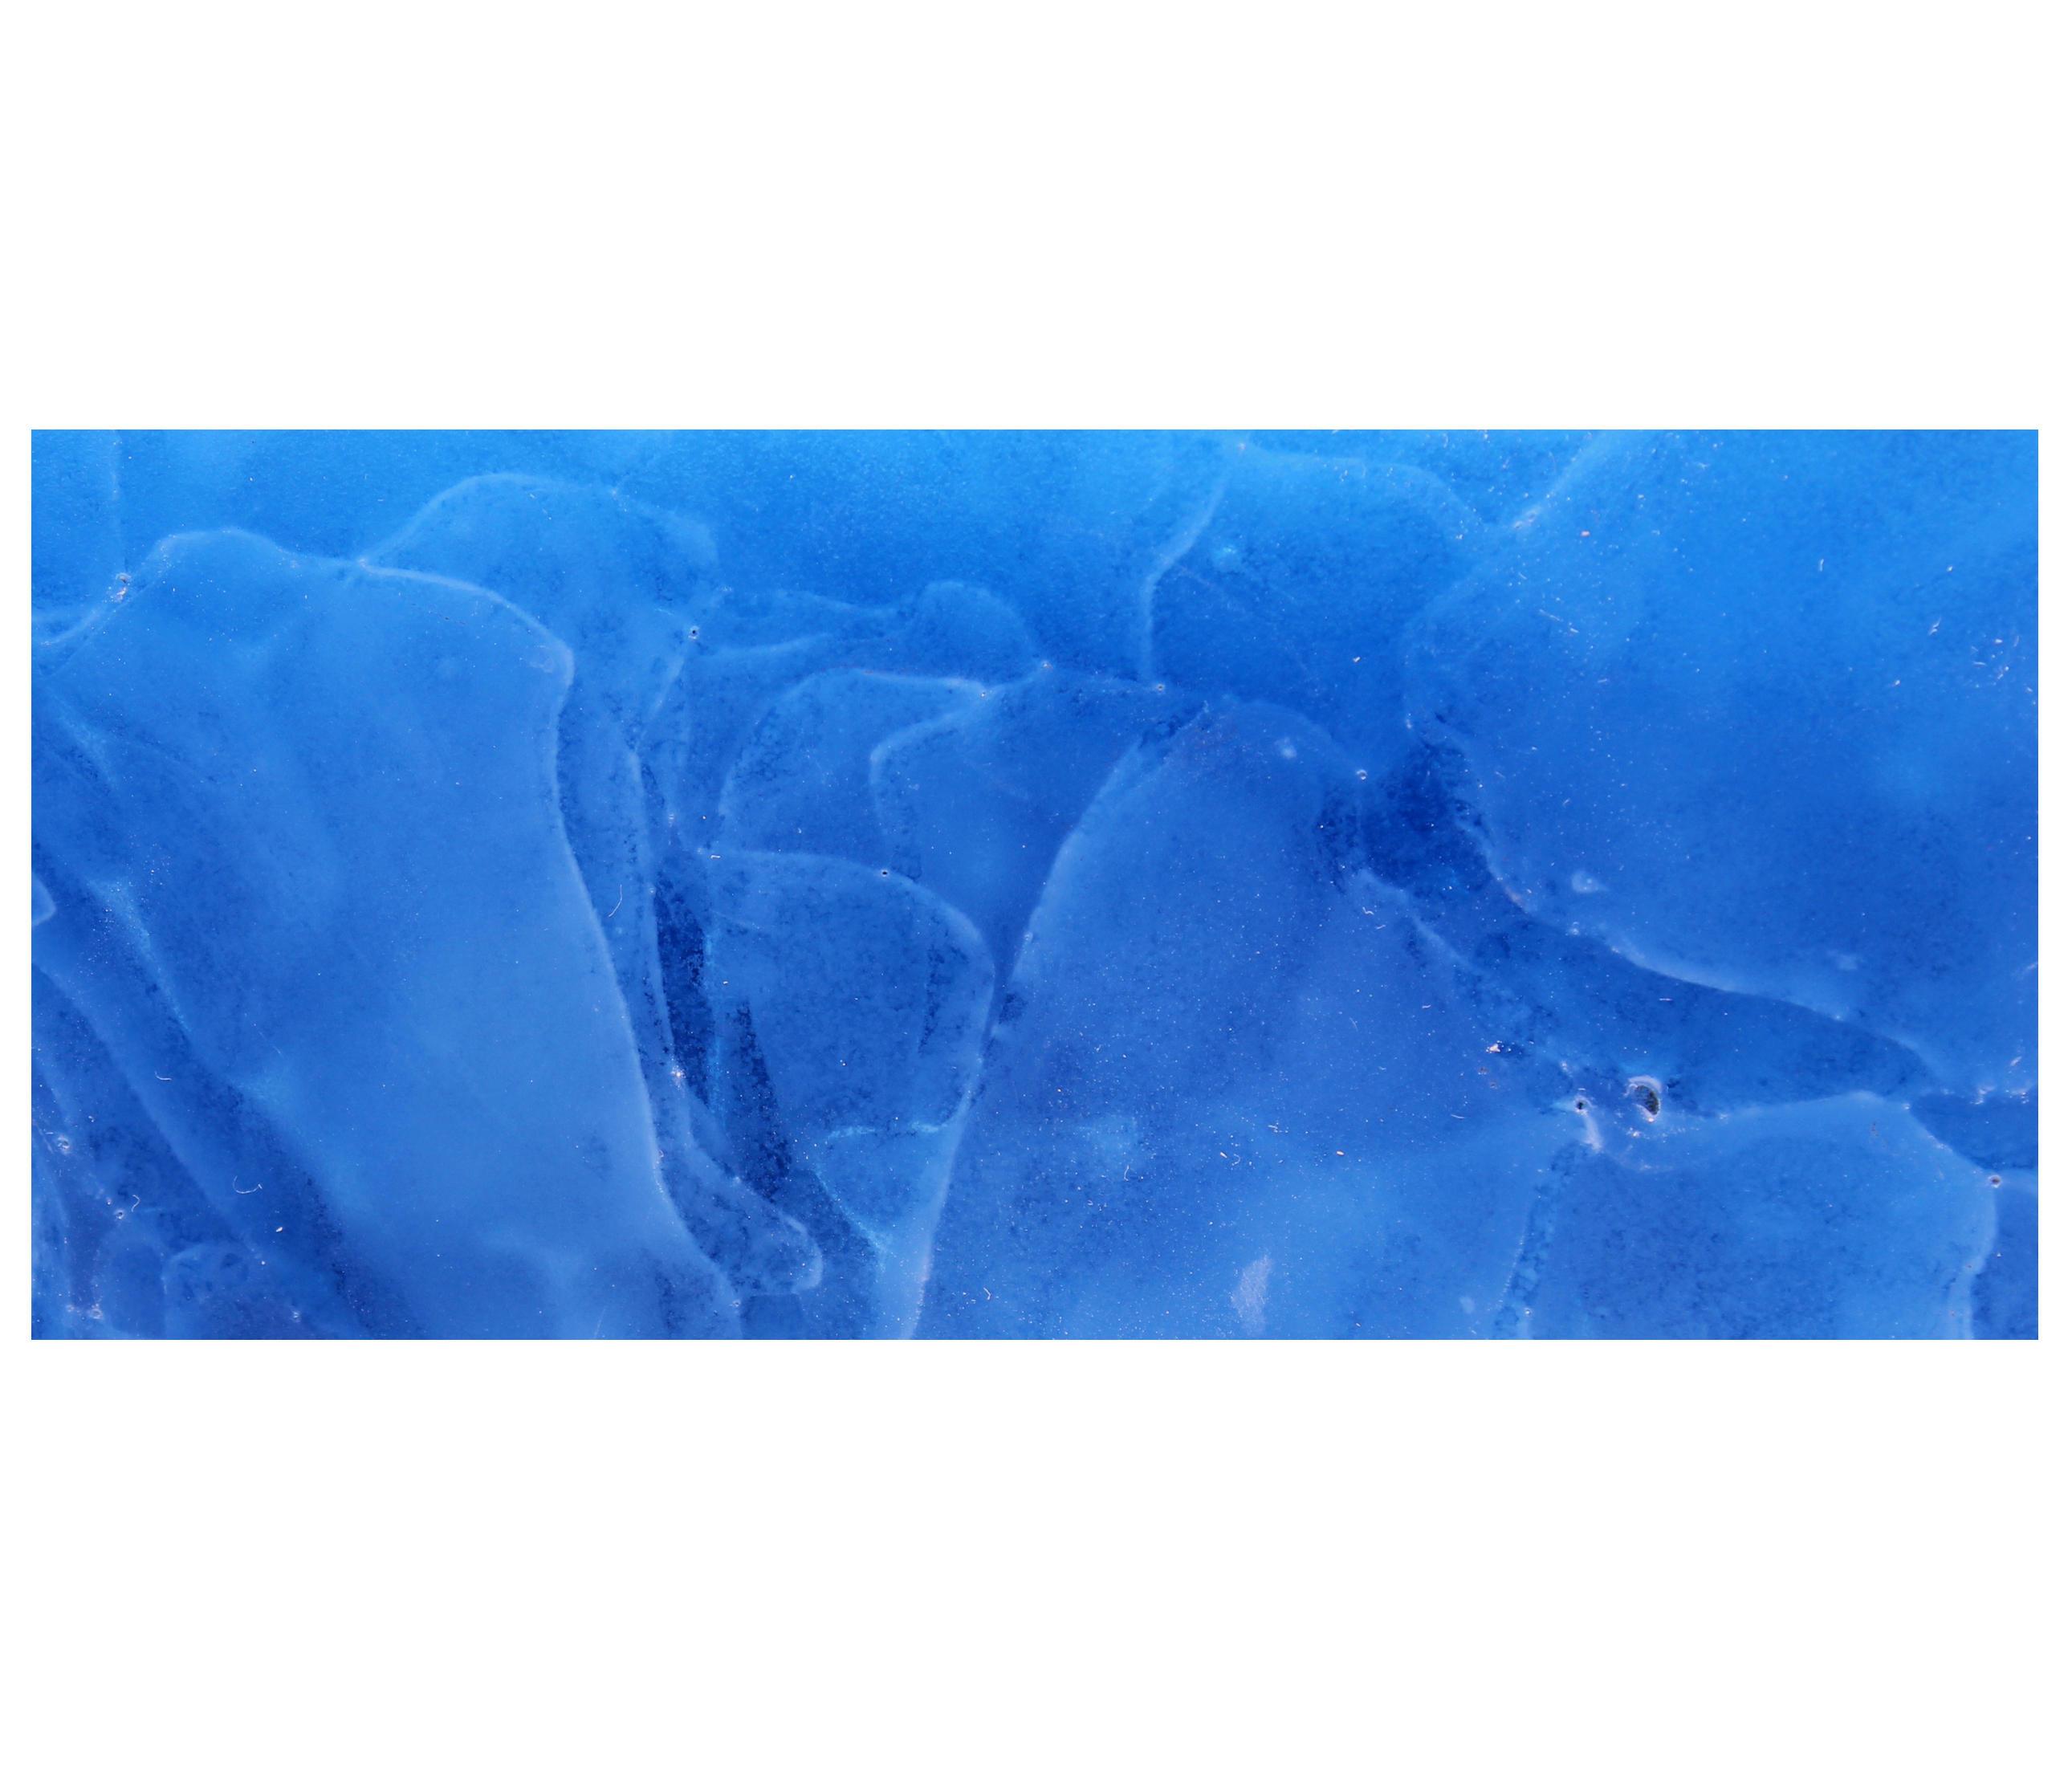 BIO-GLASS AQUAMARINE - Decorative glass from COVERINGSETC | Architonic